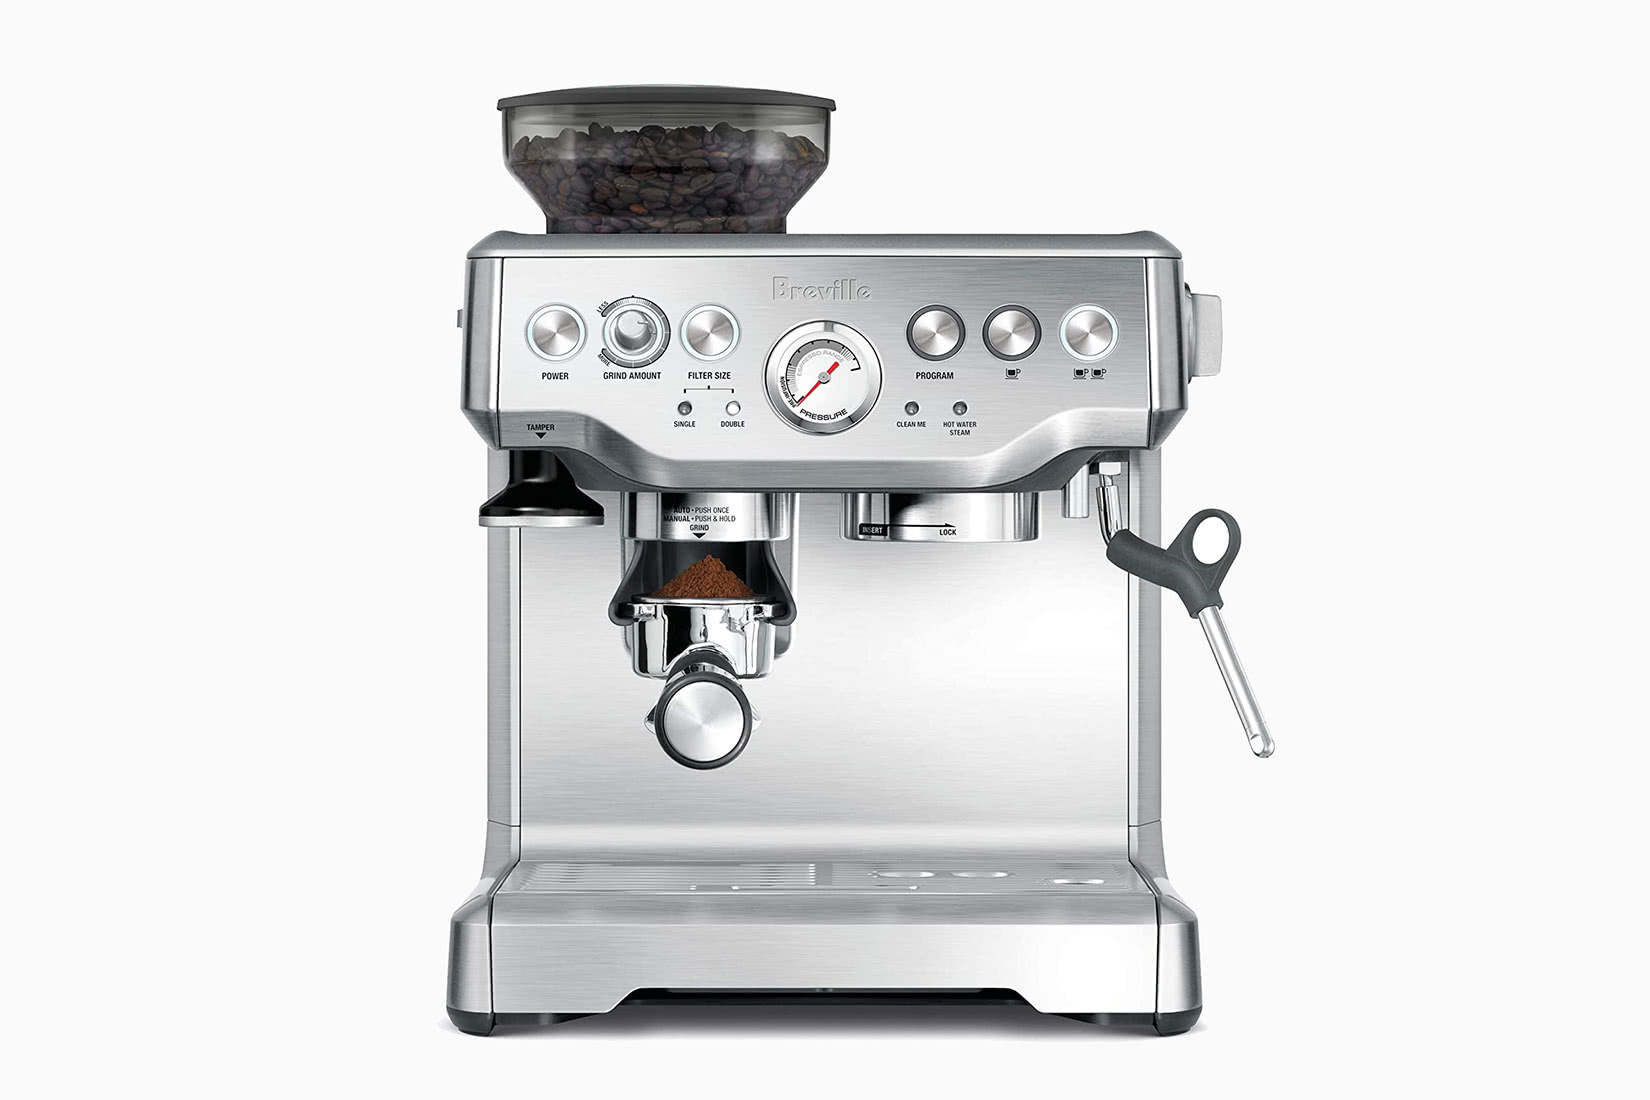 best espresso machine expensive breville barista express review - Luxe Digital